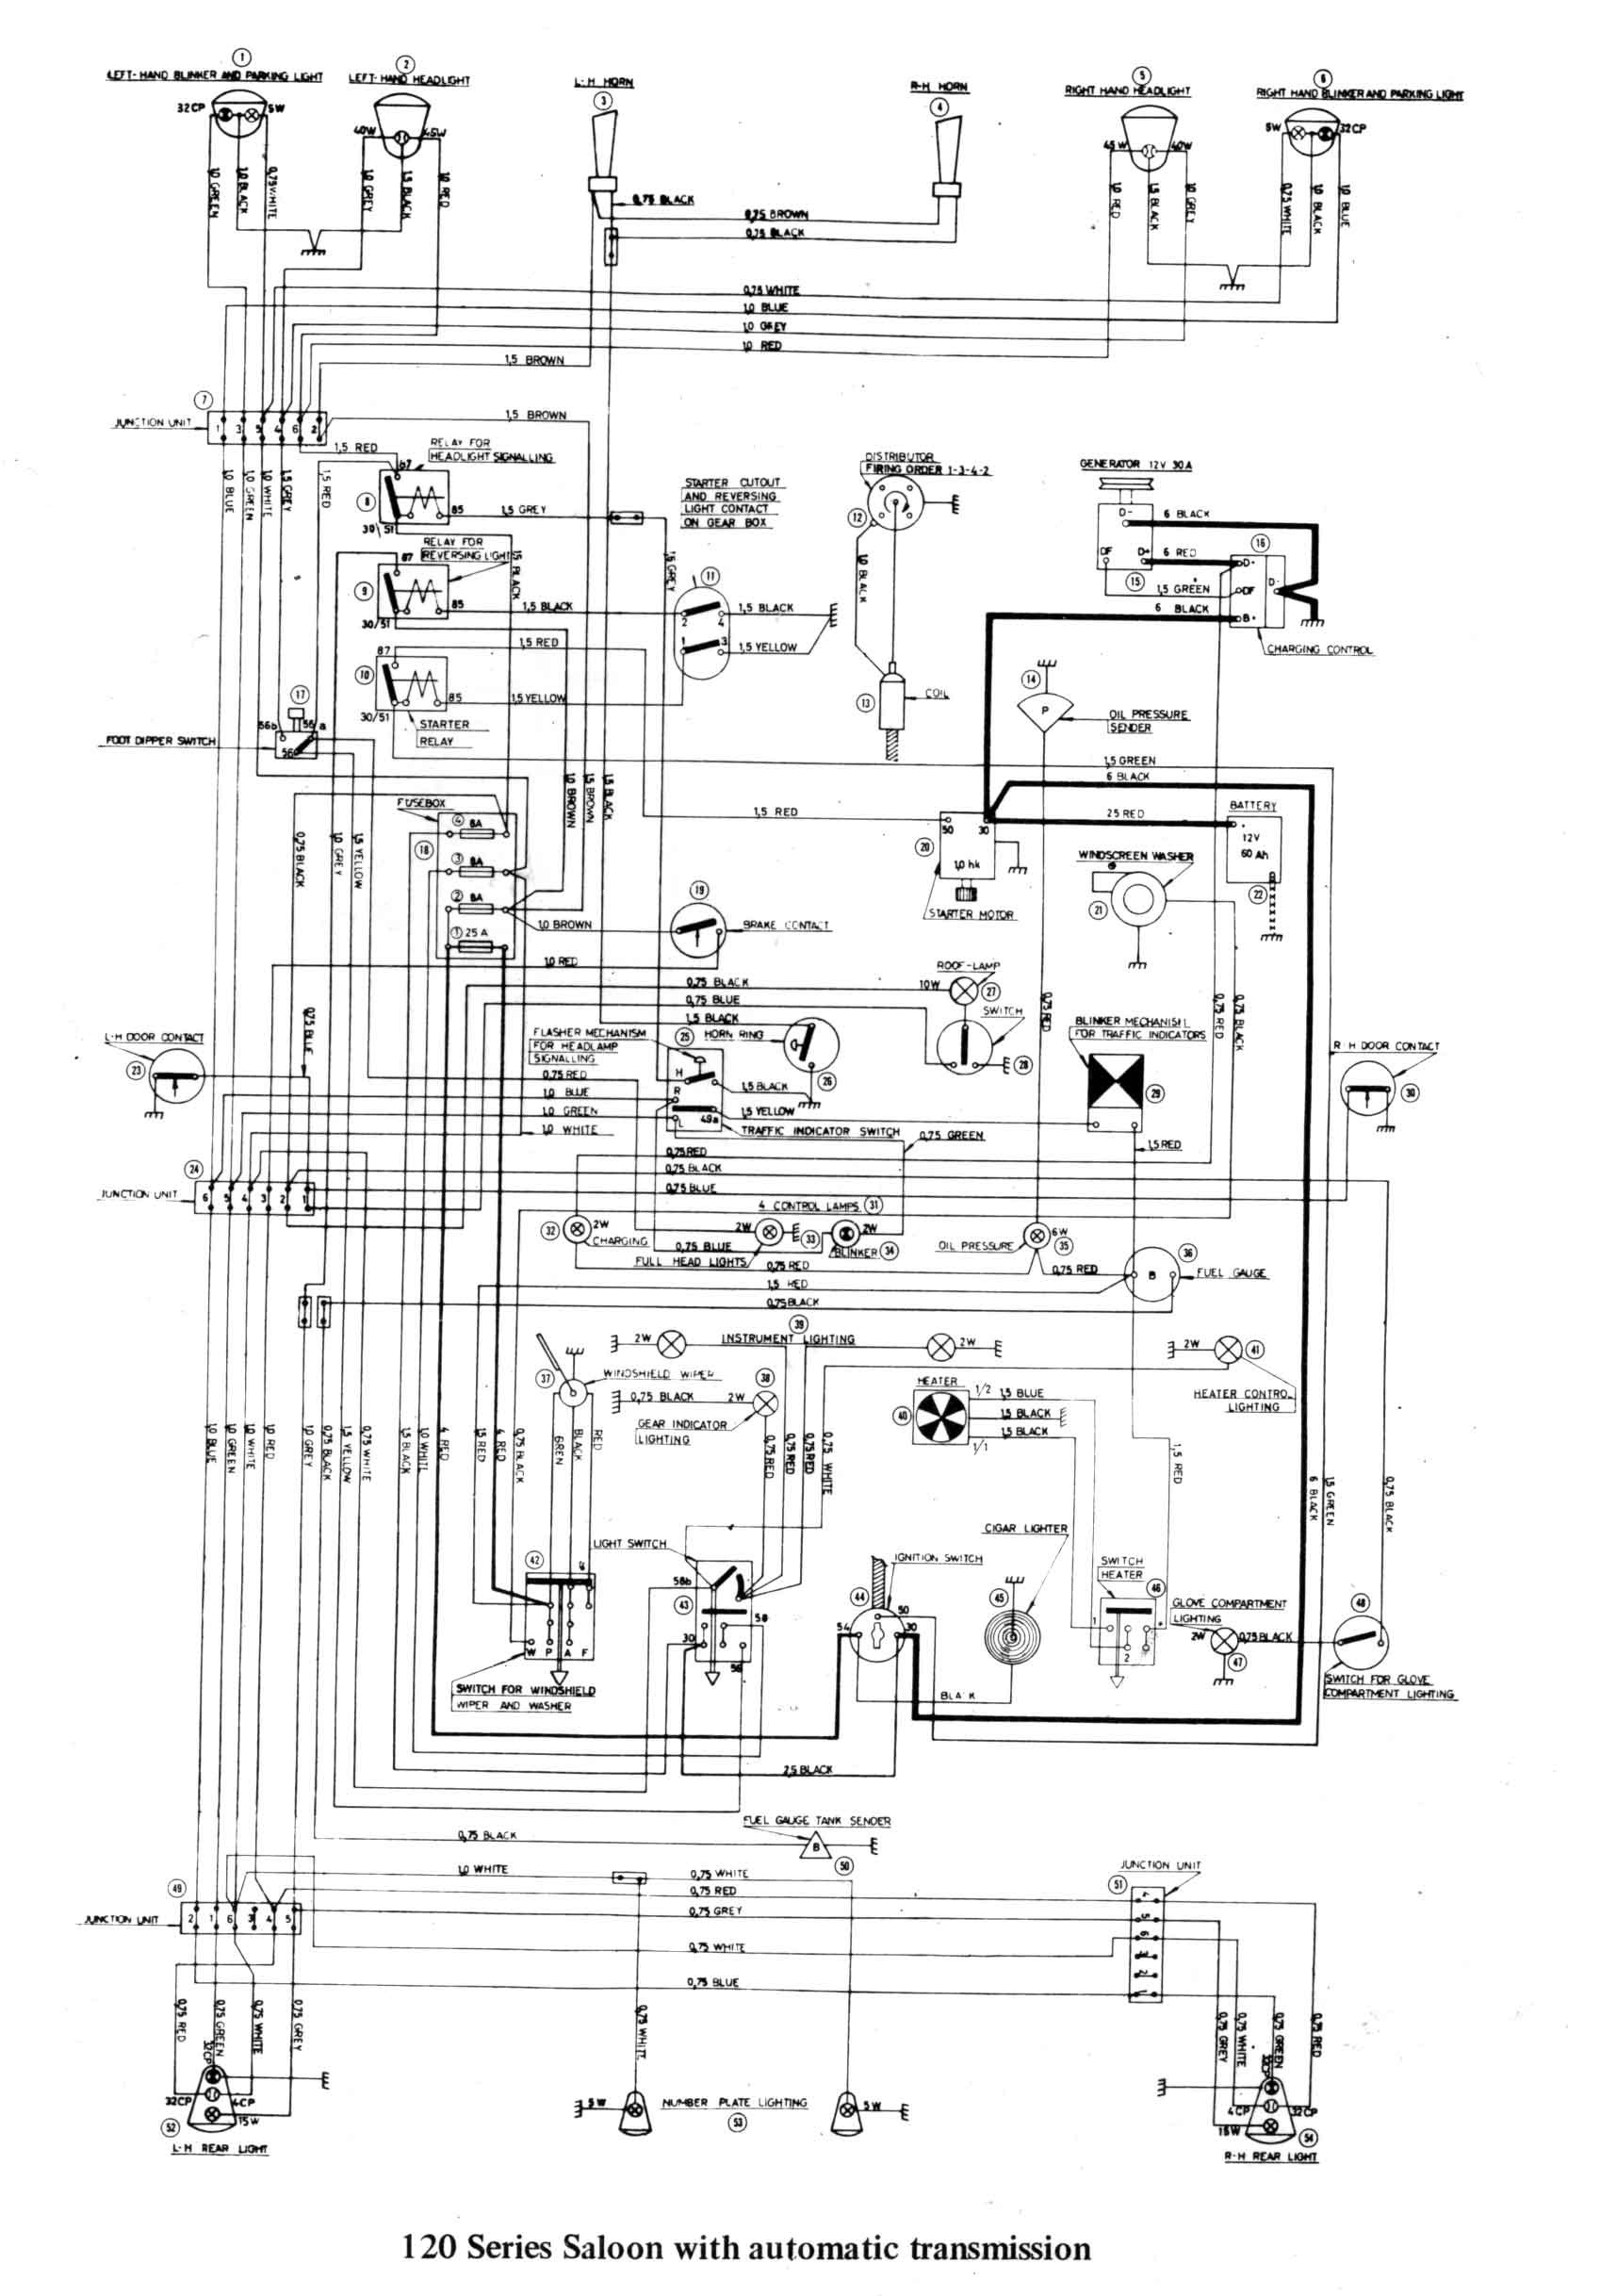 automatic transmission schematic diagram sw em od retrofitting on a rh detoxicrecenze com Automatic Transmission Parts Diagram Upper Transmission Mount Diagram